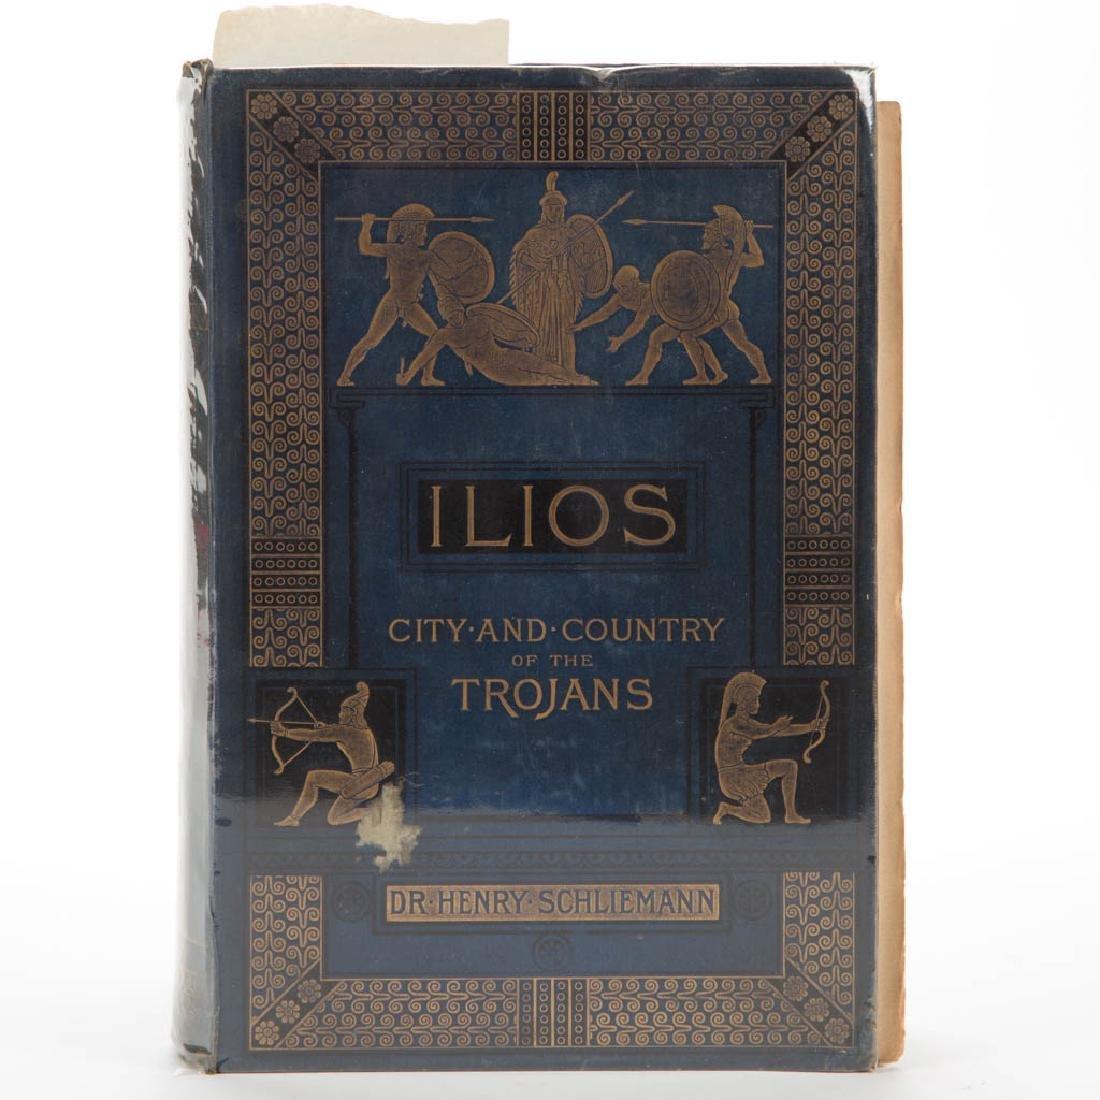 ANTIQUITIES / GREEK HISTORICAL VOLUME